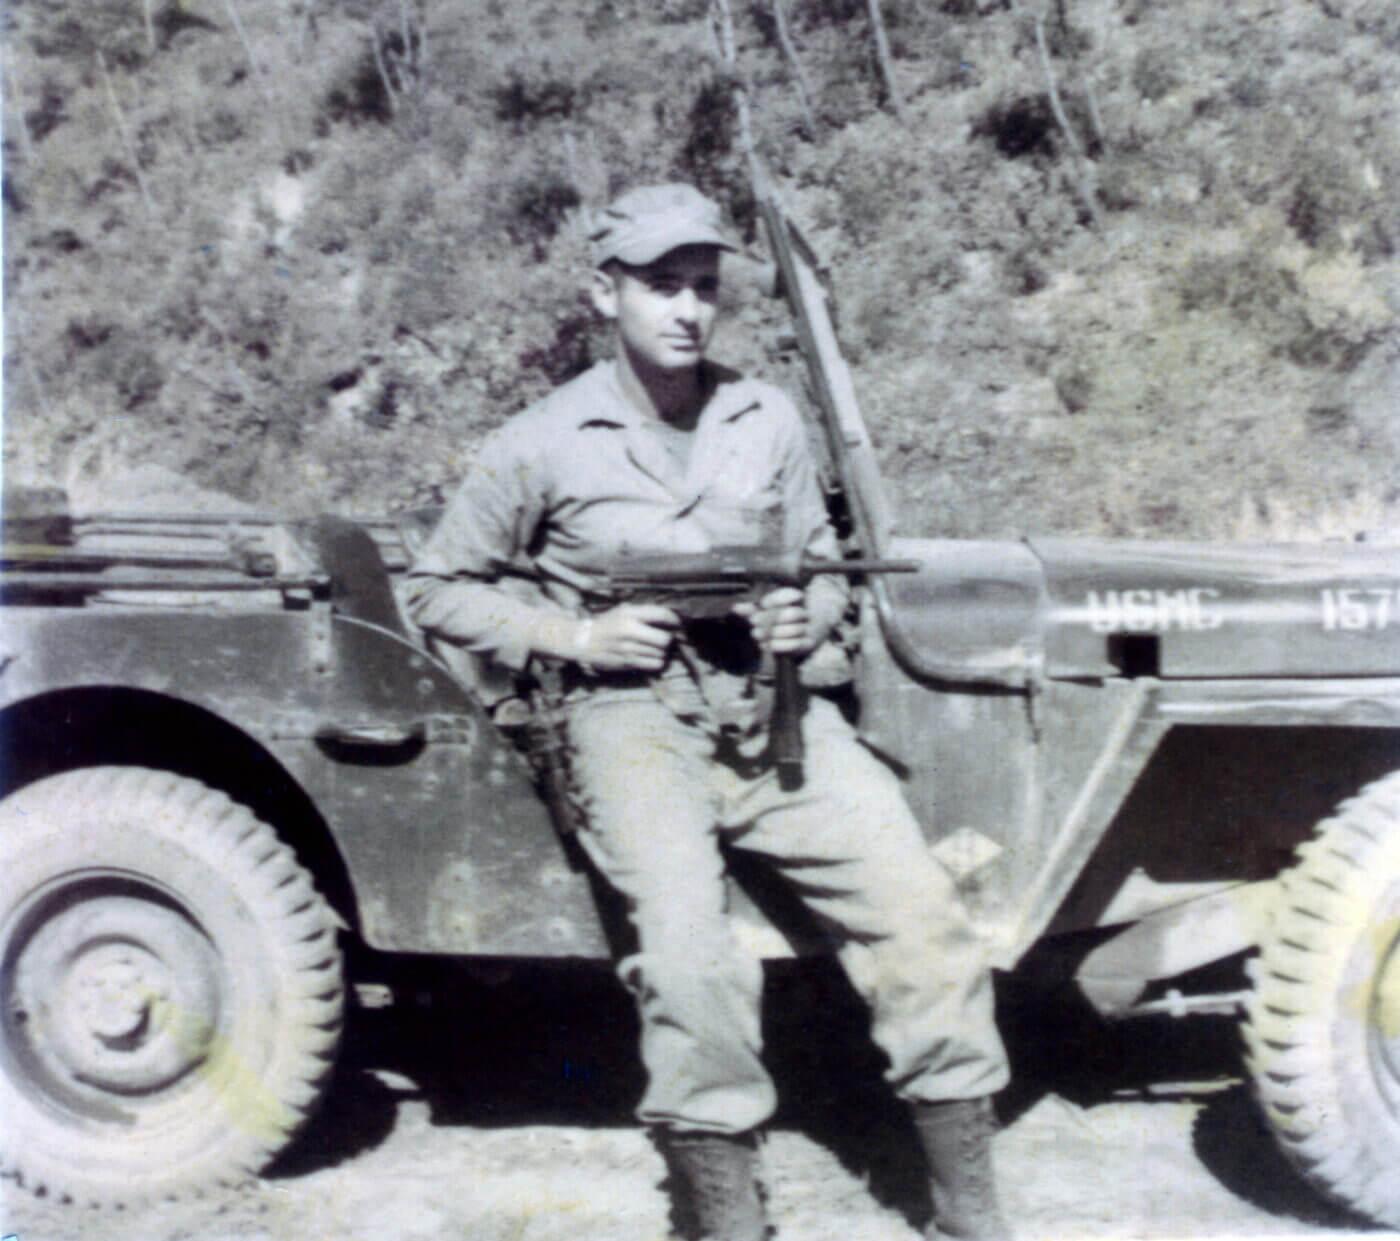 Grease gun held by USMC soldier in 1952 in Korea